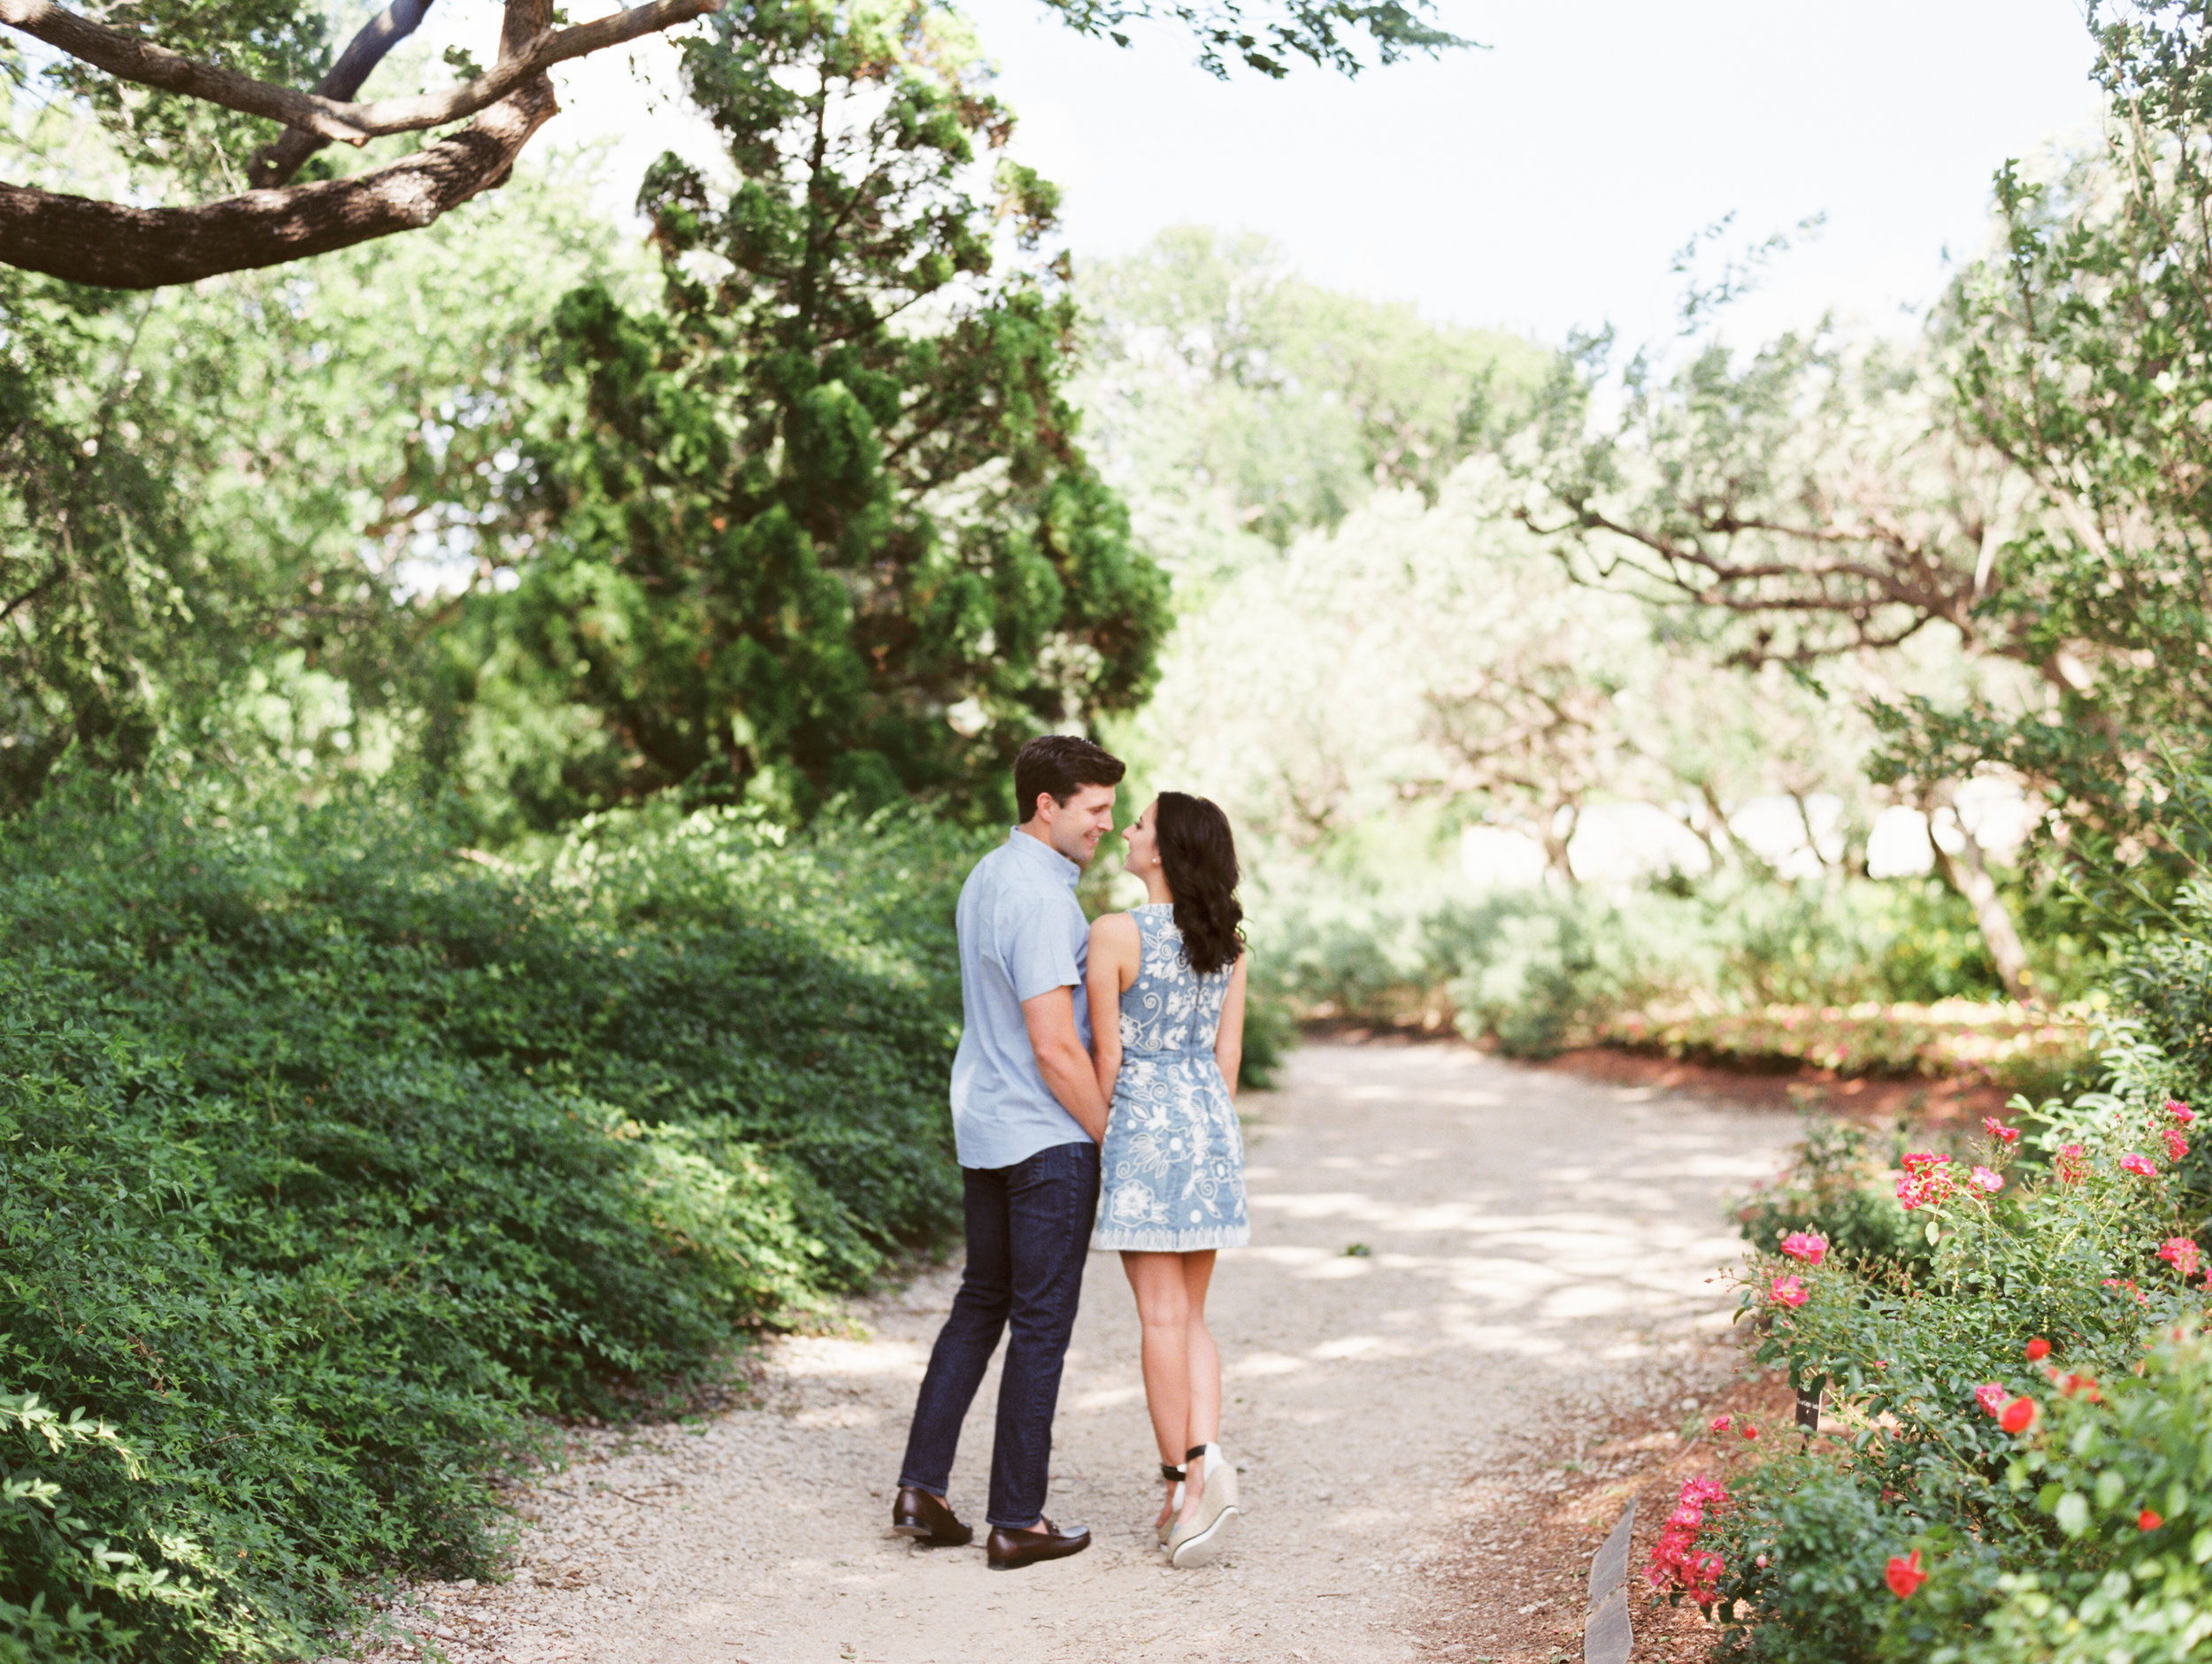 dallas-texas-dallas-arboretum-botanical-garden-engagements-ar-photography-teresa-rowan-43.jpg